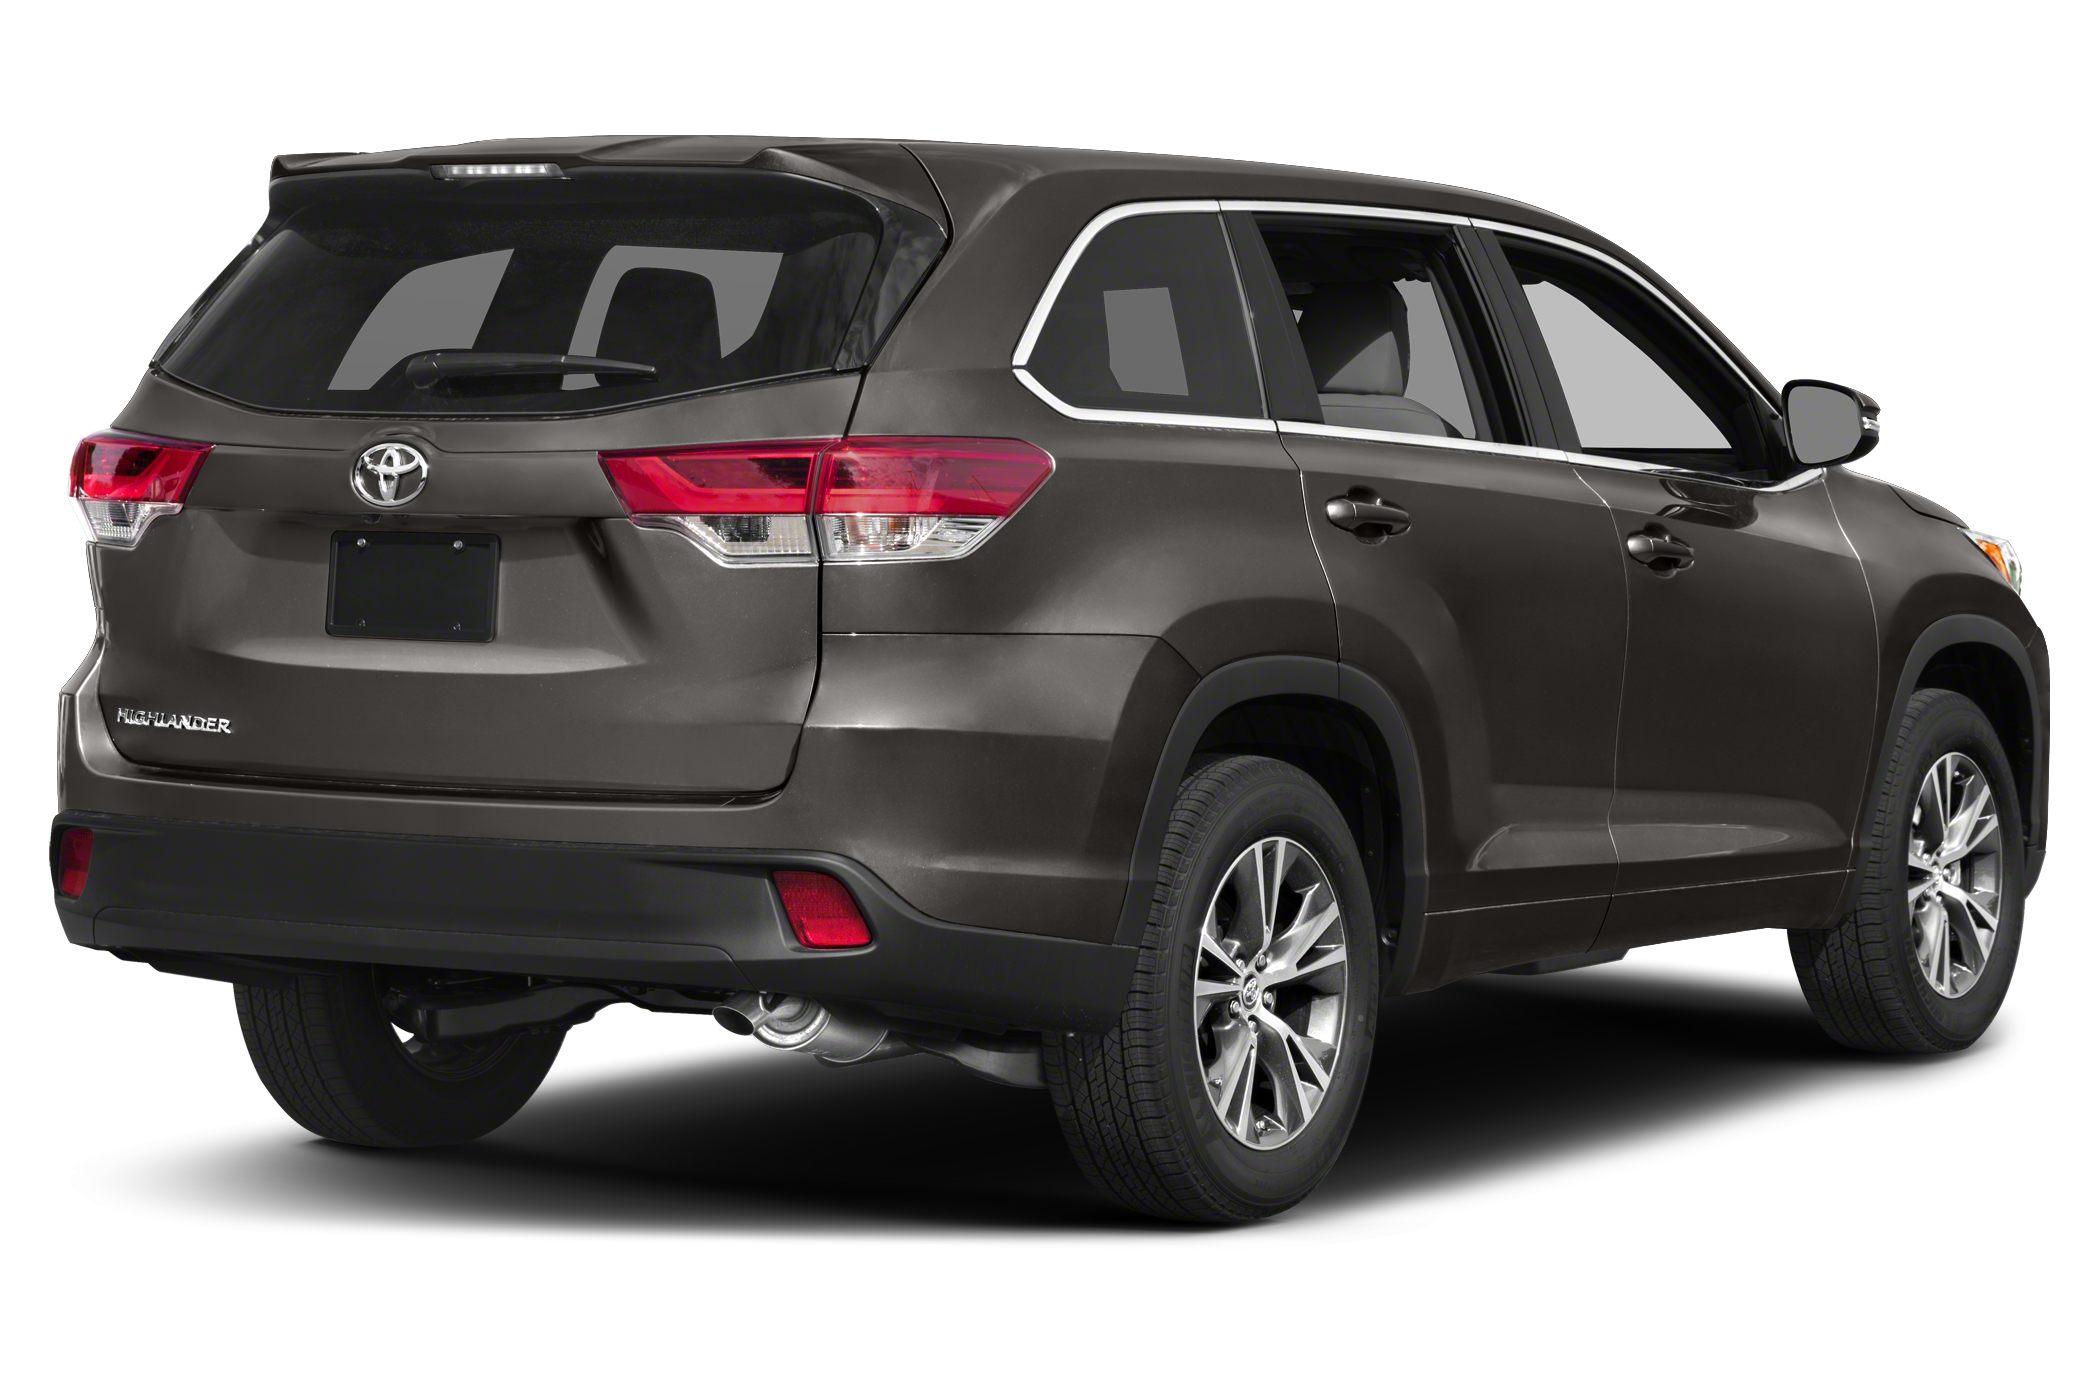 Lease Toyota Highlander >> See 2018 Toyota Highlander Color Options - CarsDirect